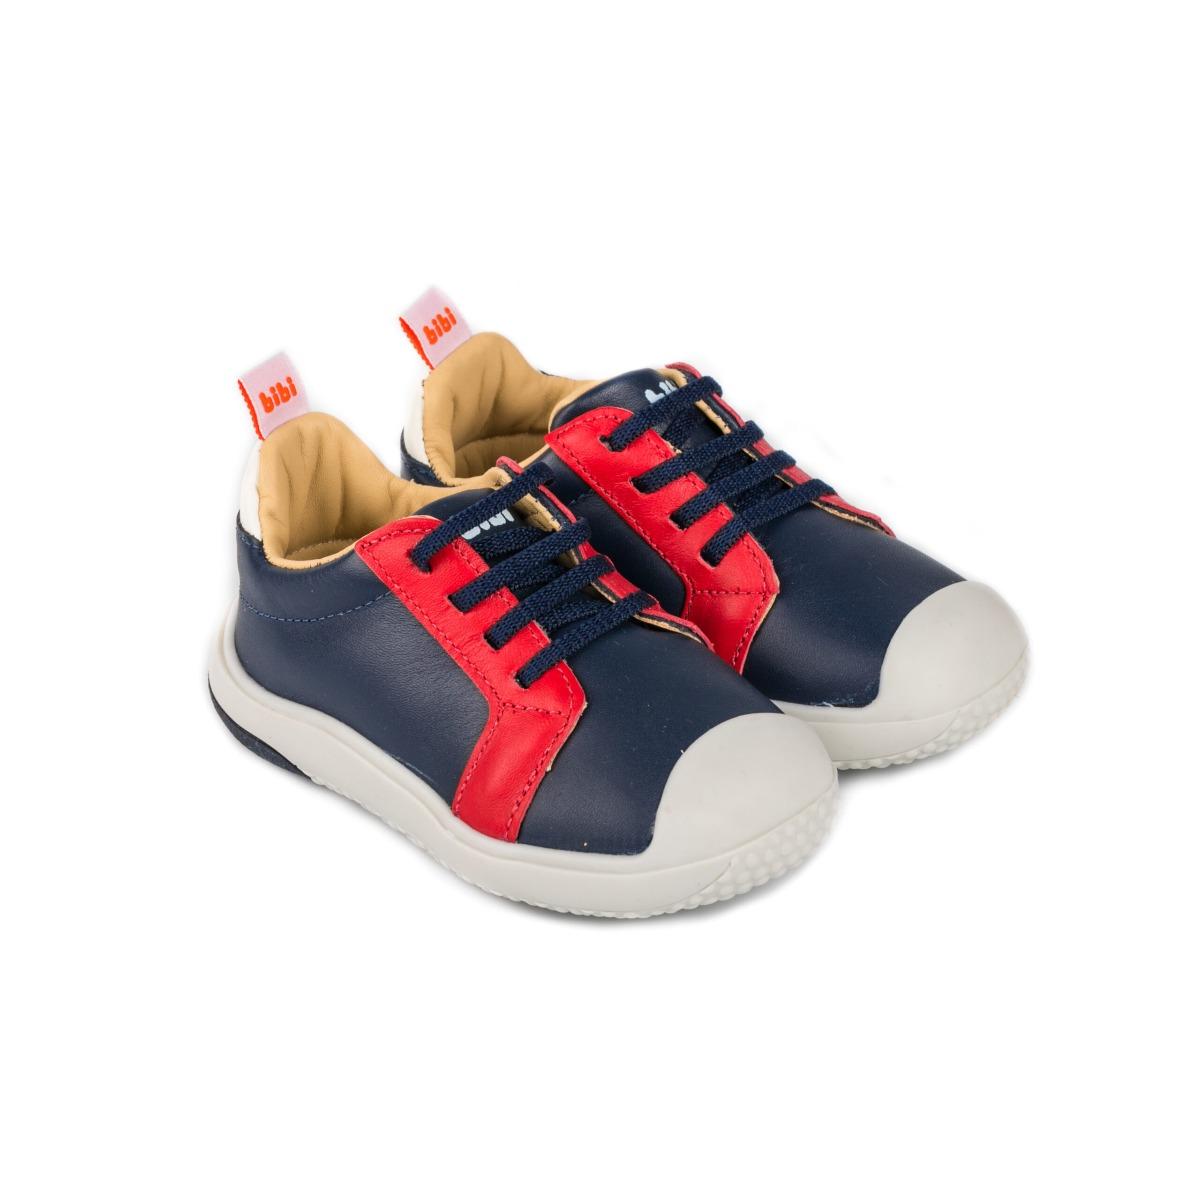 Pantofi sport cu siret Bibi Shoes Prewalker Naval, Bleumarin imagine